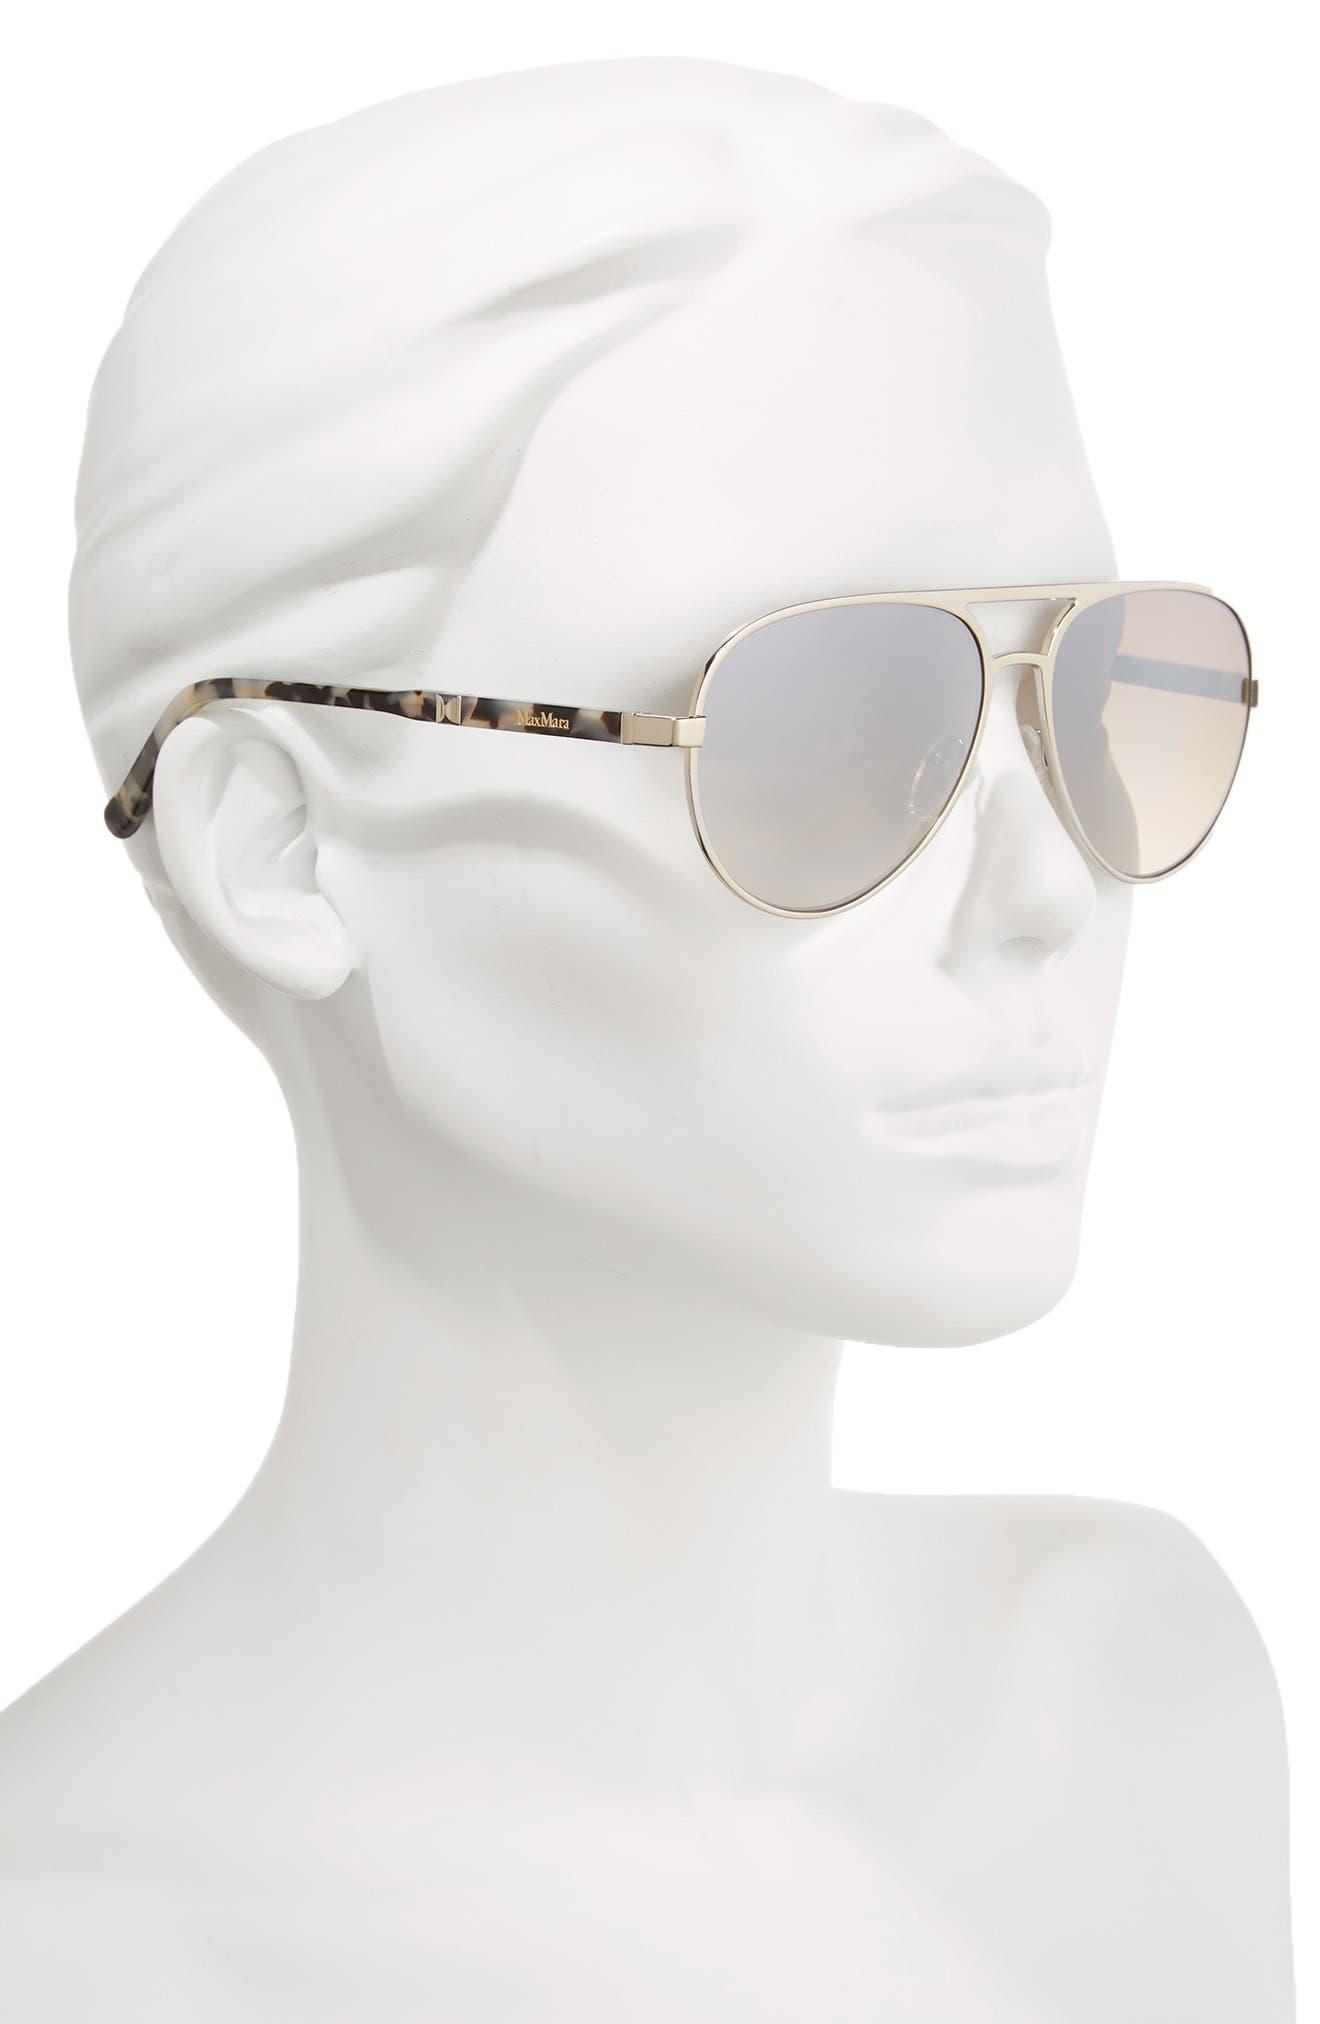 Desigs 57mm Gradient Aviator Sunglasses,                             Alternate thumbnail 4, color,